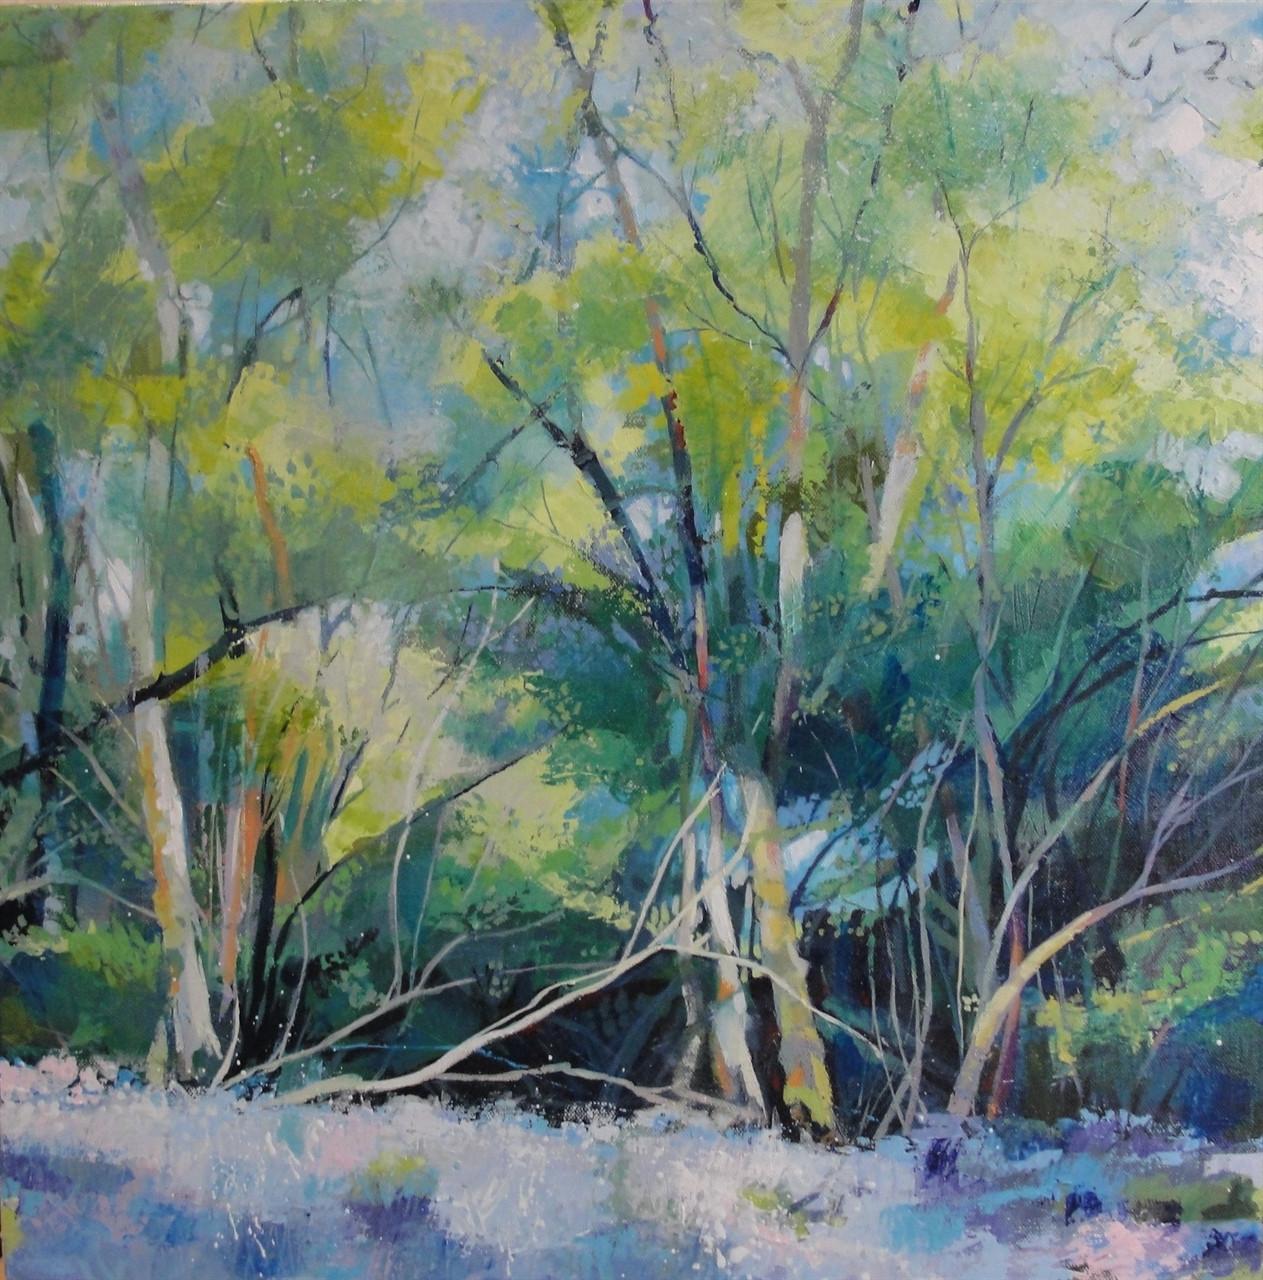 Bruern Bluebells, Cotswolds